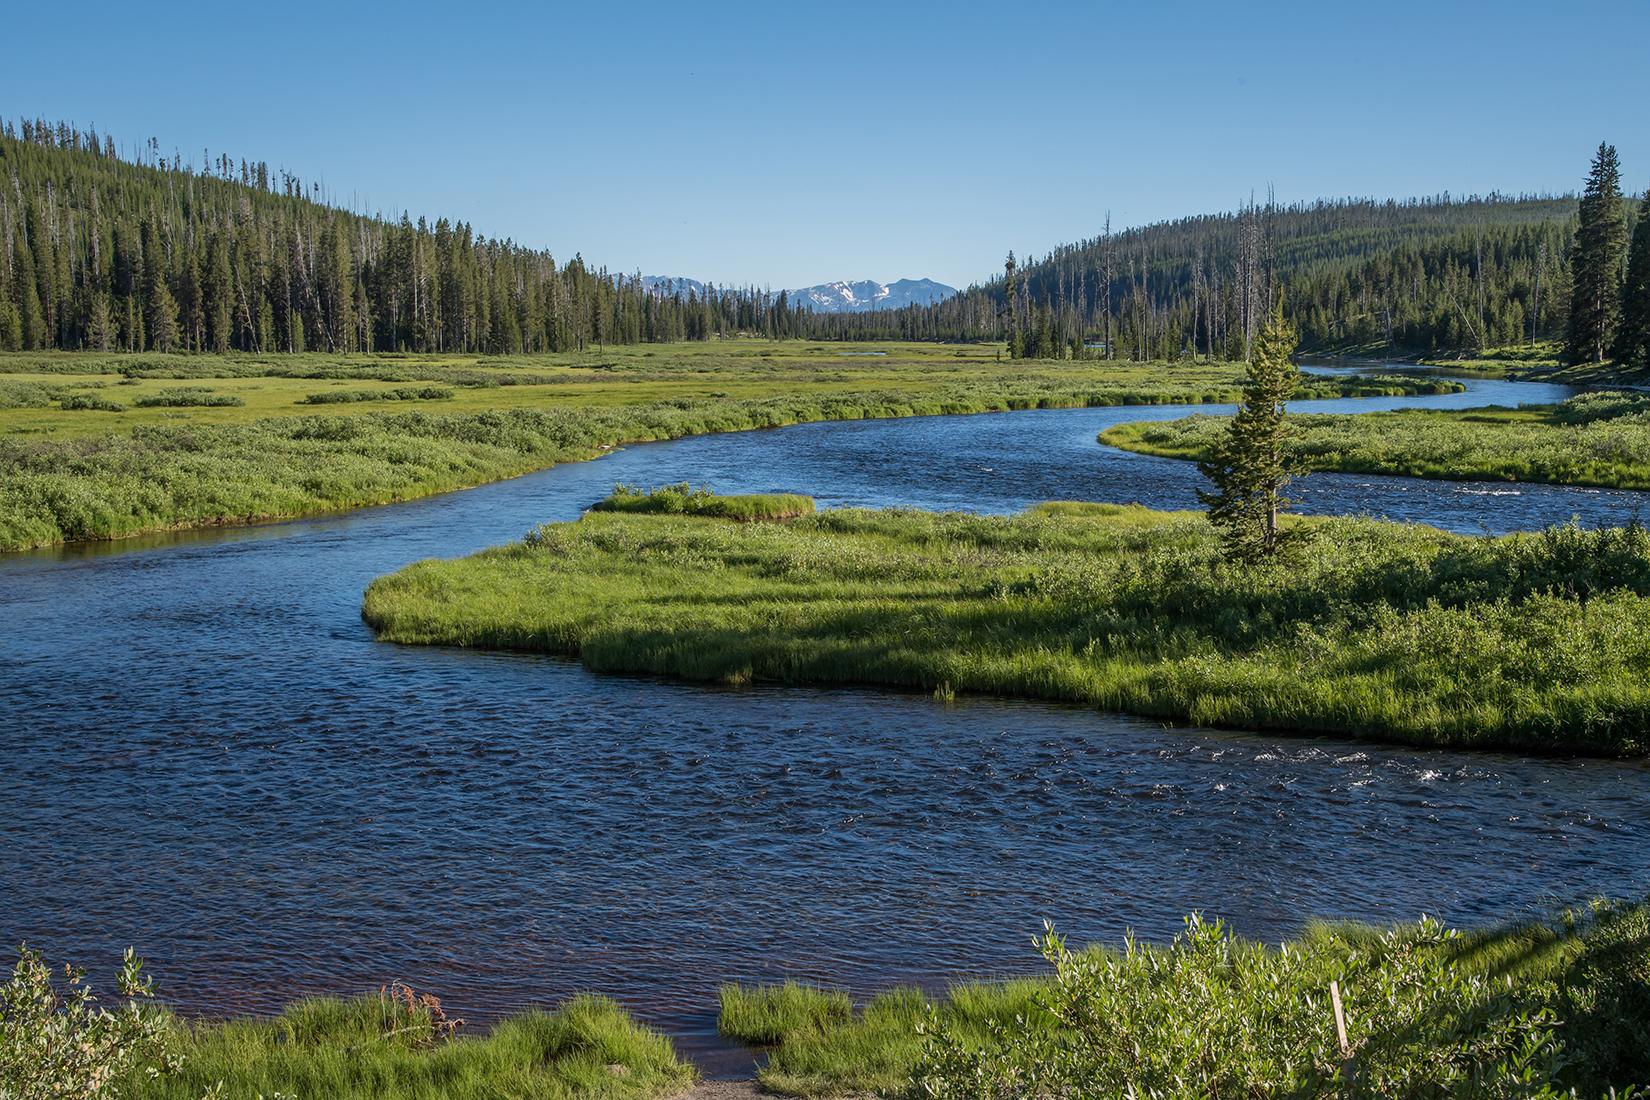 Measuring Conservation Progress in North America